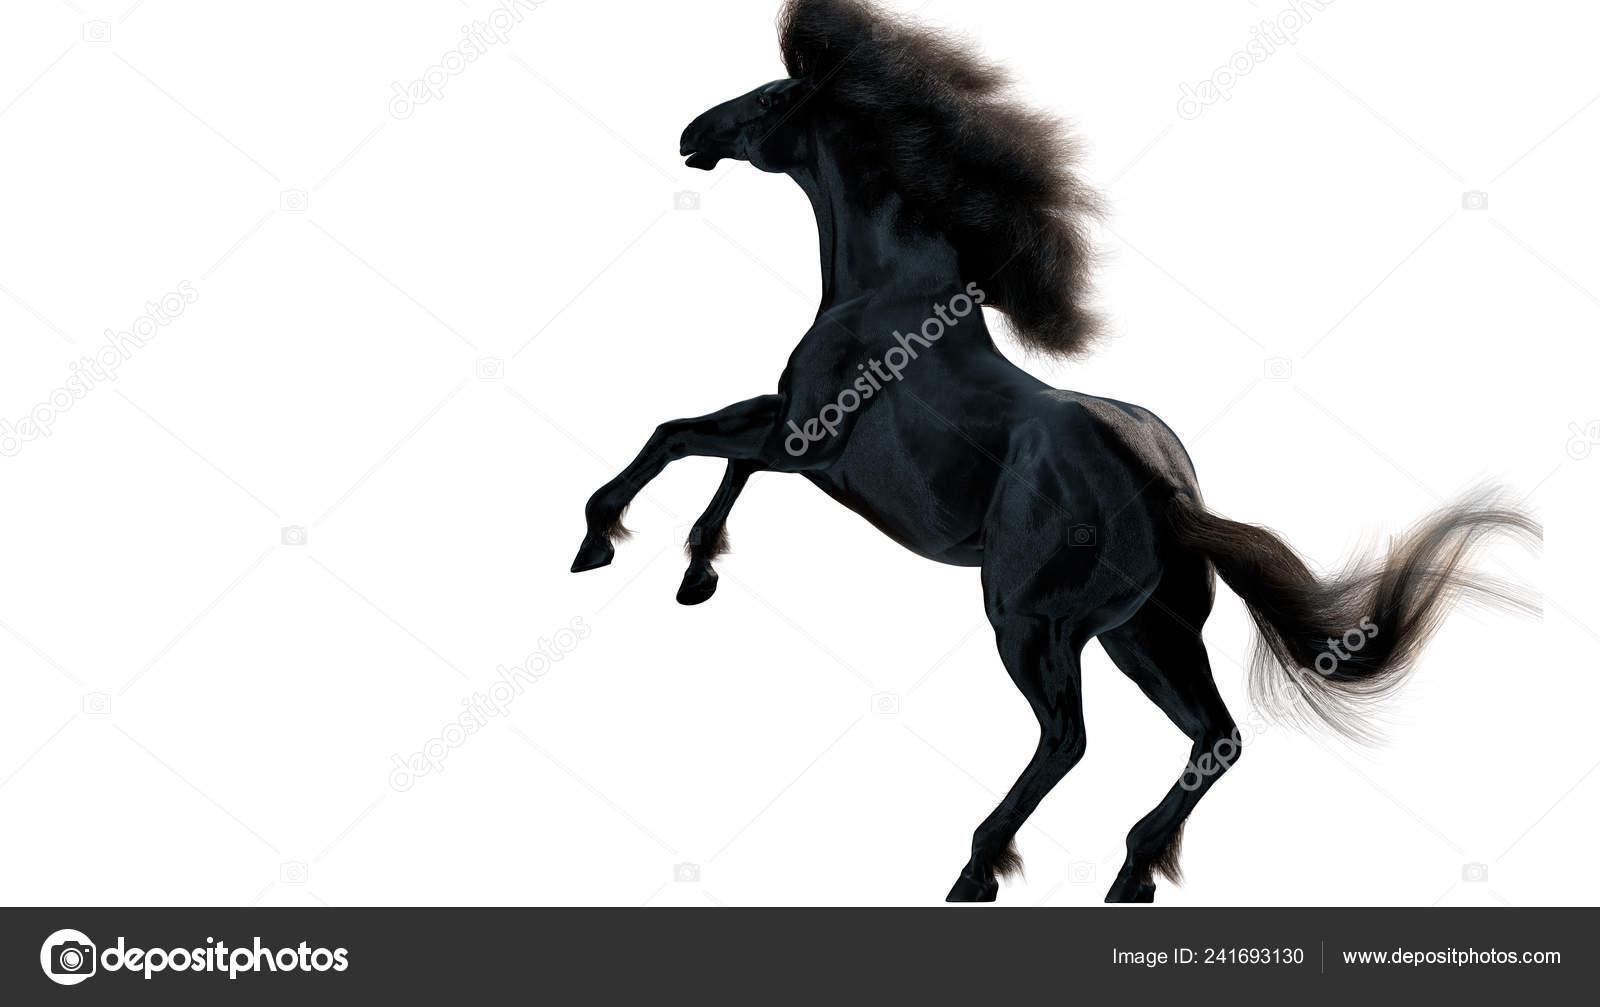 Black Running Horse White Background Illustration Stock Photo C Vitaliy Sokol 241693130